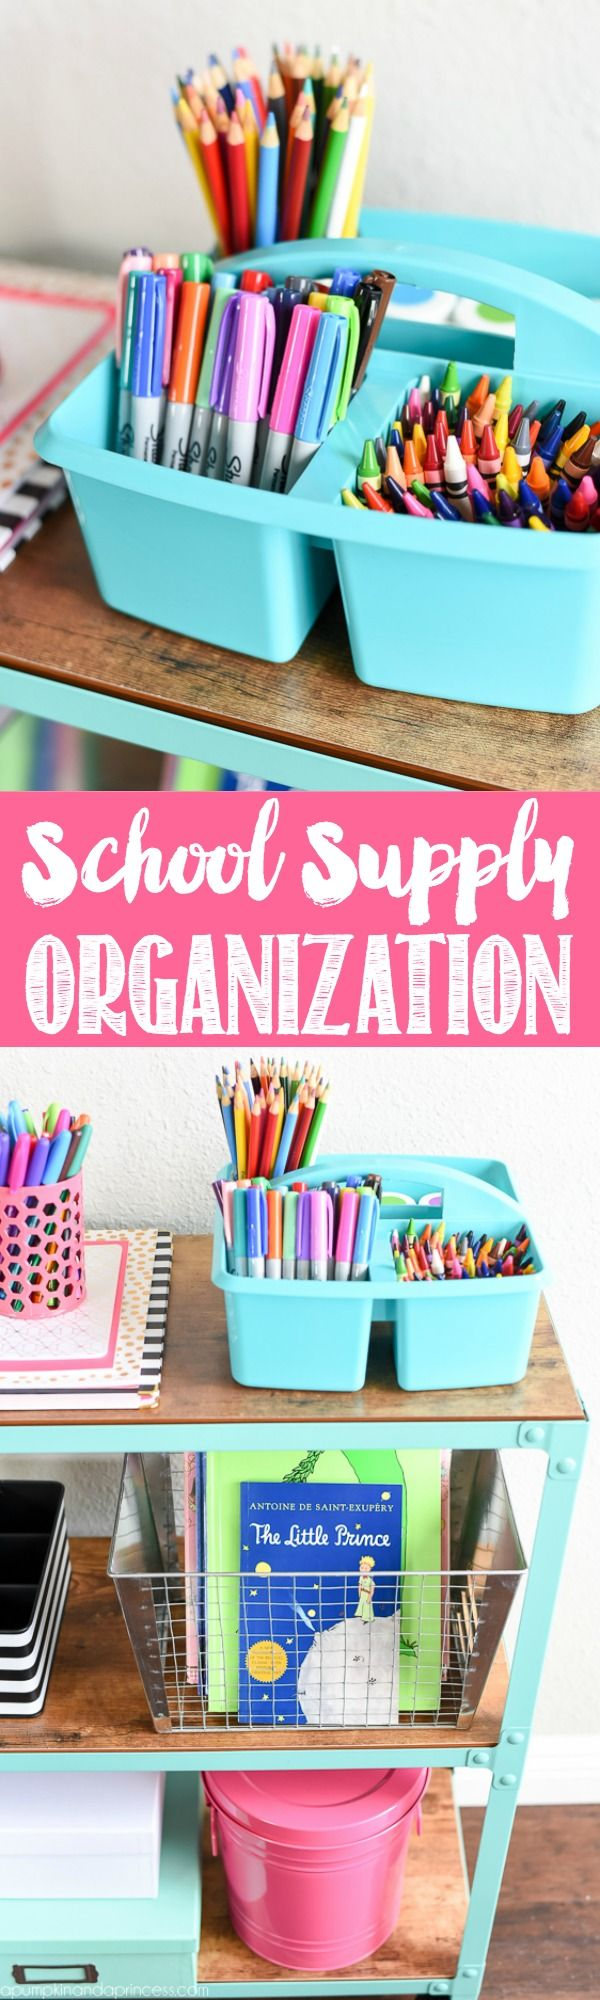 School Supply Organization Diy School Supplies School Office Organization School Supplies Organization